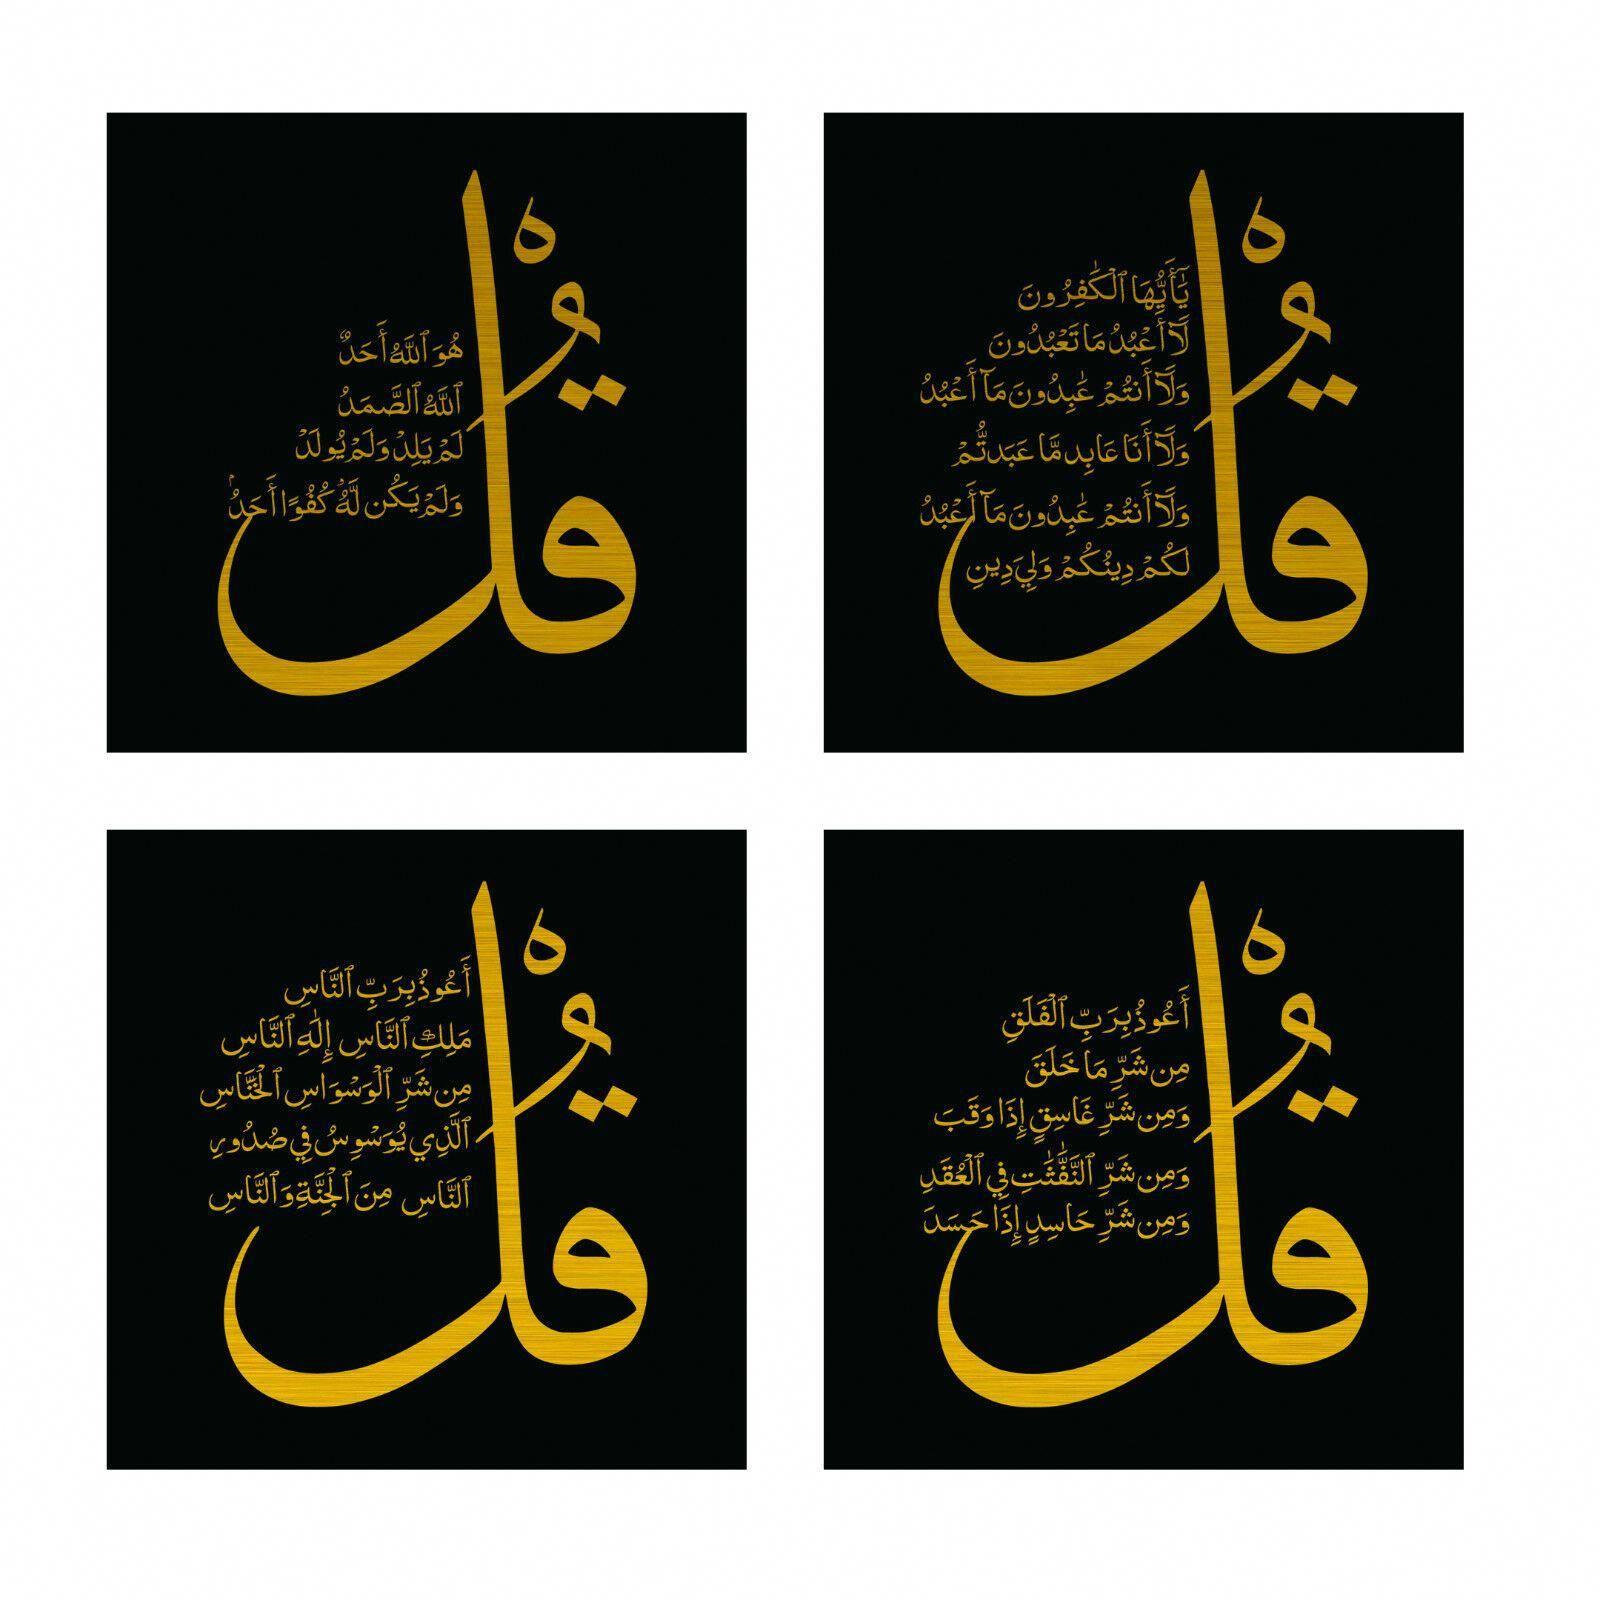 Ca Gold Marketing Group Islamic Wall Art Calligraphy Wall Art Canvas Wall Art